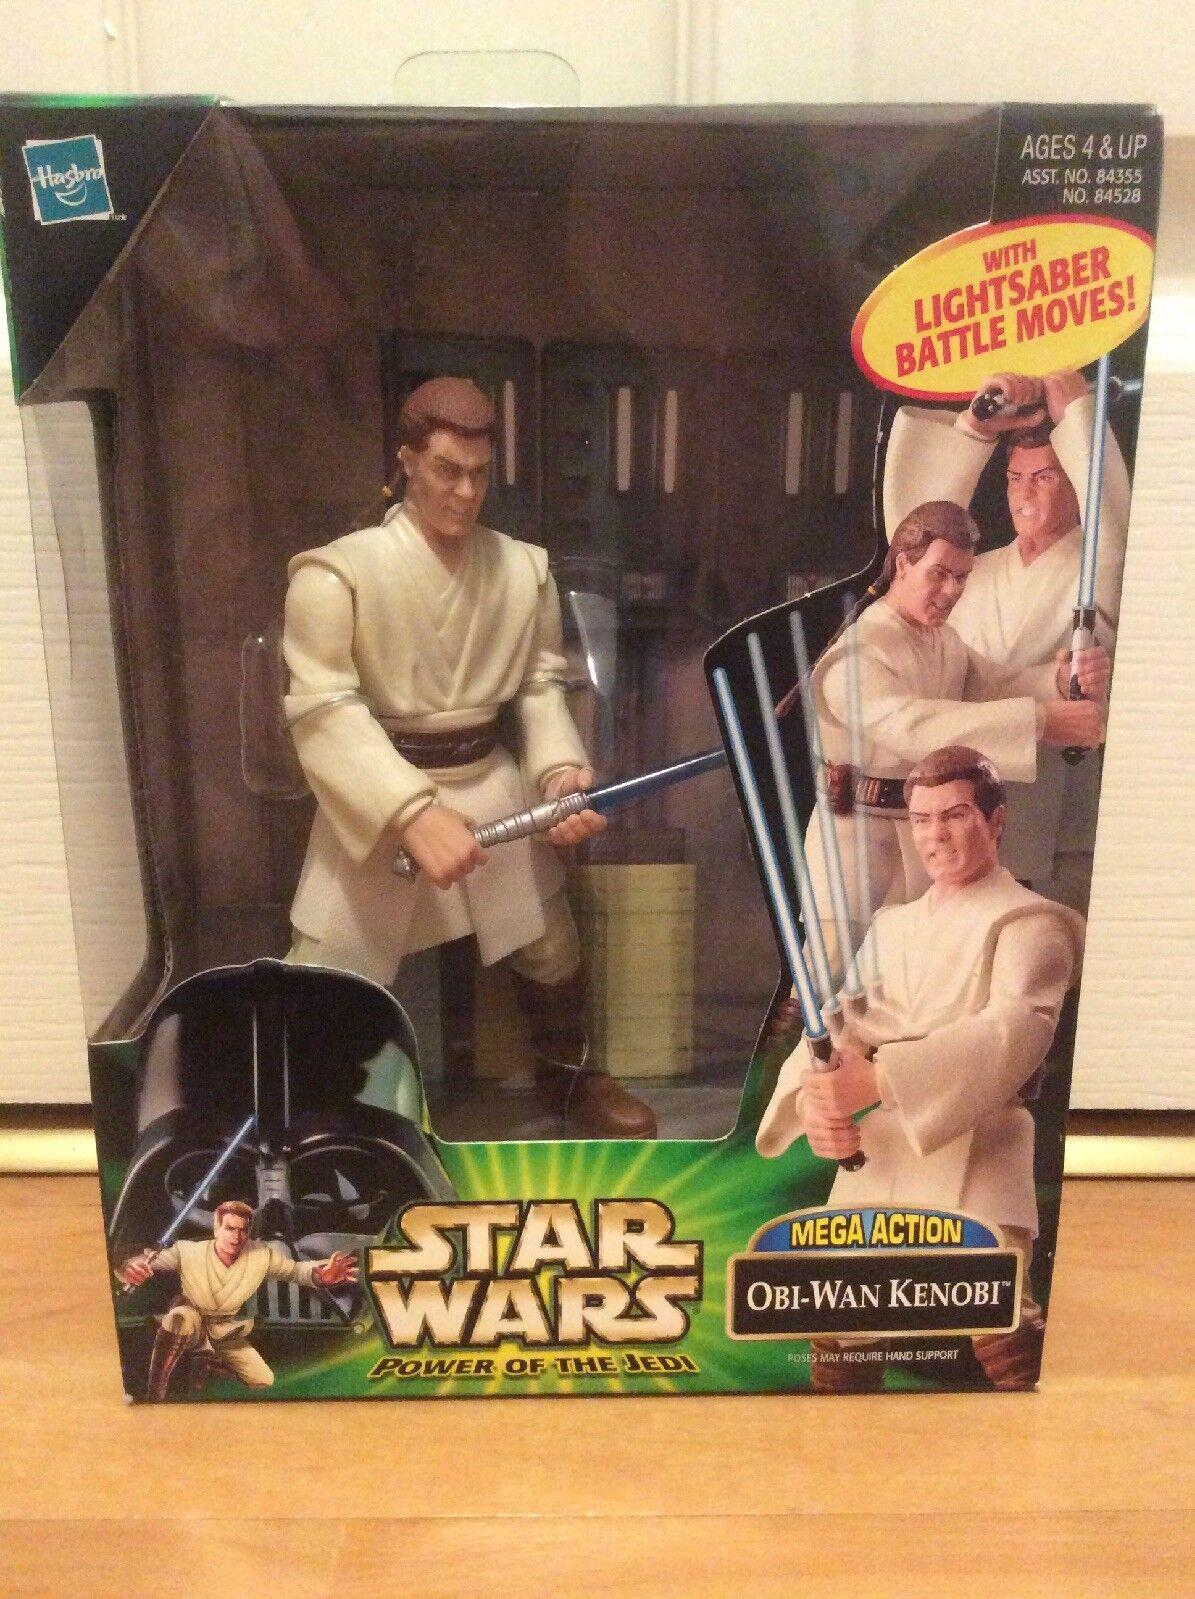 Star Wars Power Of The Jedi Mega Action Obi-Wan Kenobi Action Figure MISB Rare